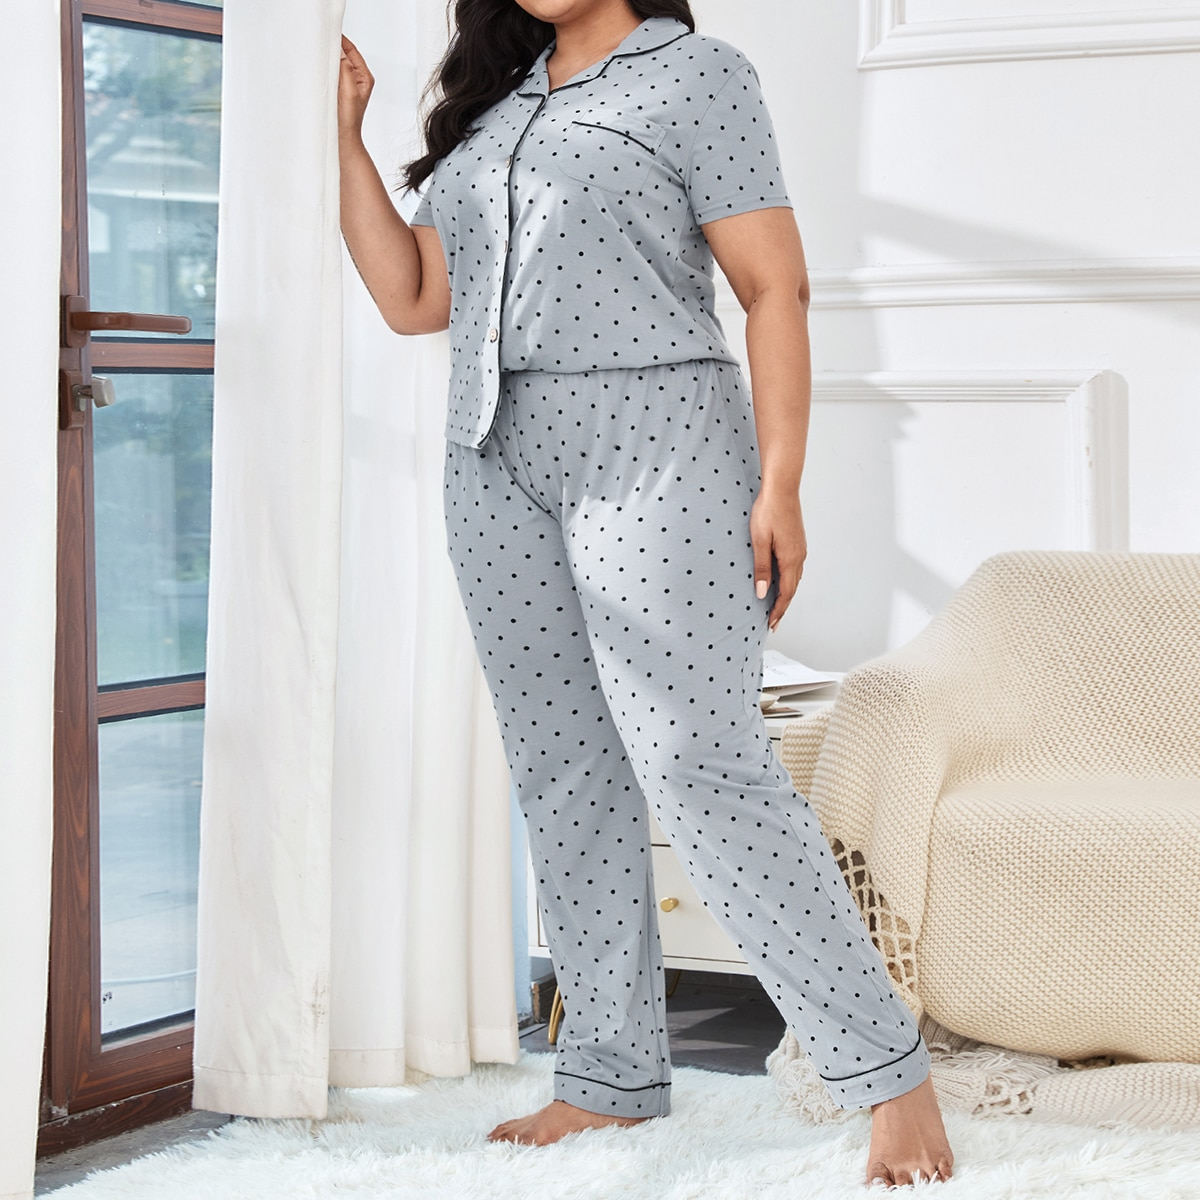 Conjunto de pijama de lunares